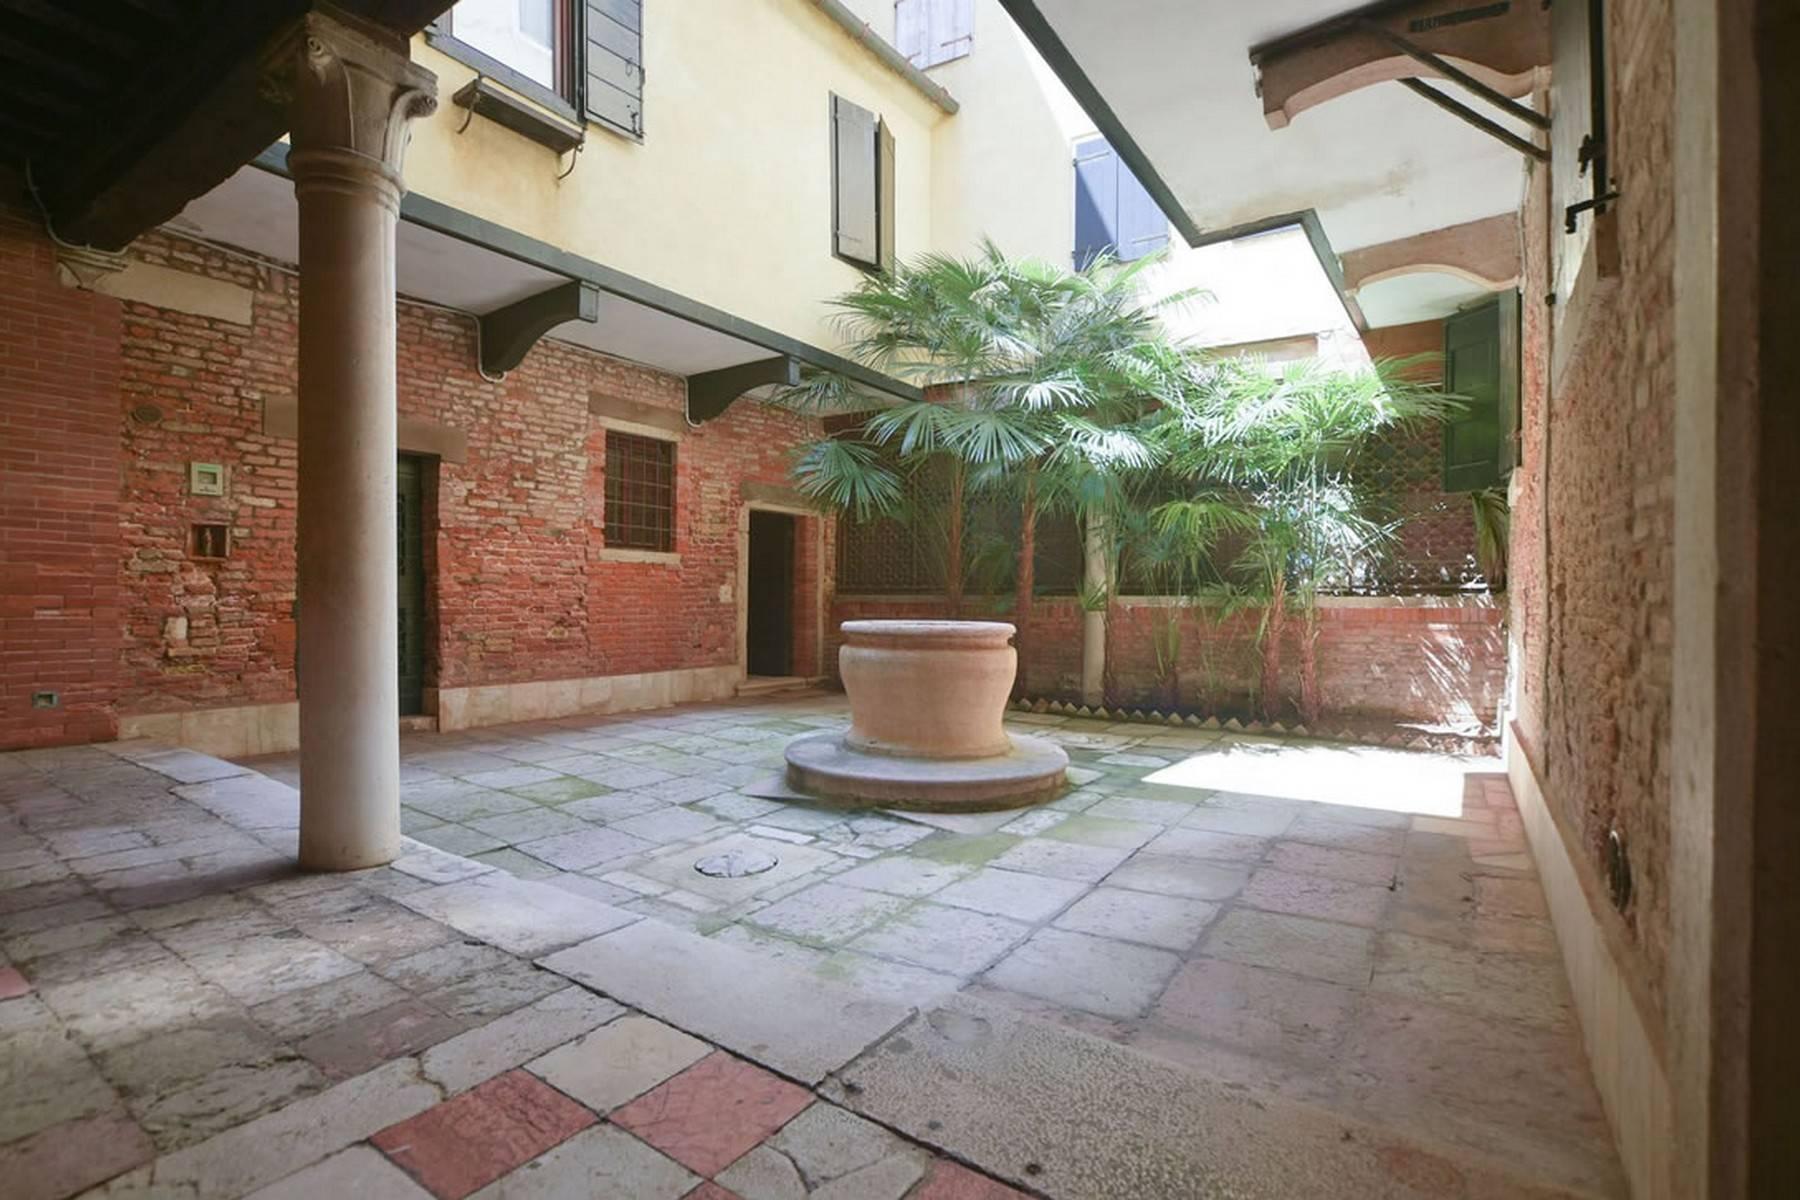 Appartement de design dans le Palazzo Querini Stampalia / S.M. Formosa - 6